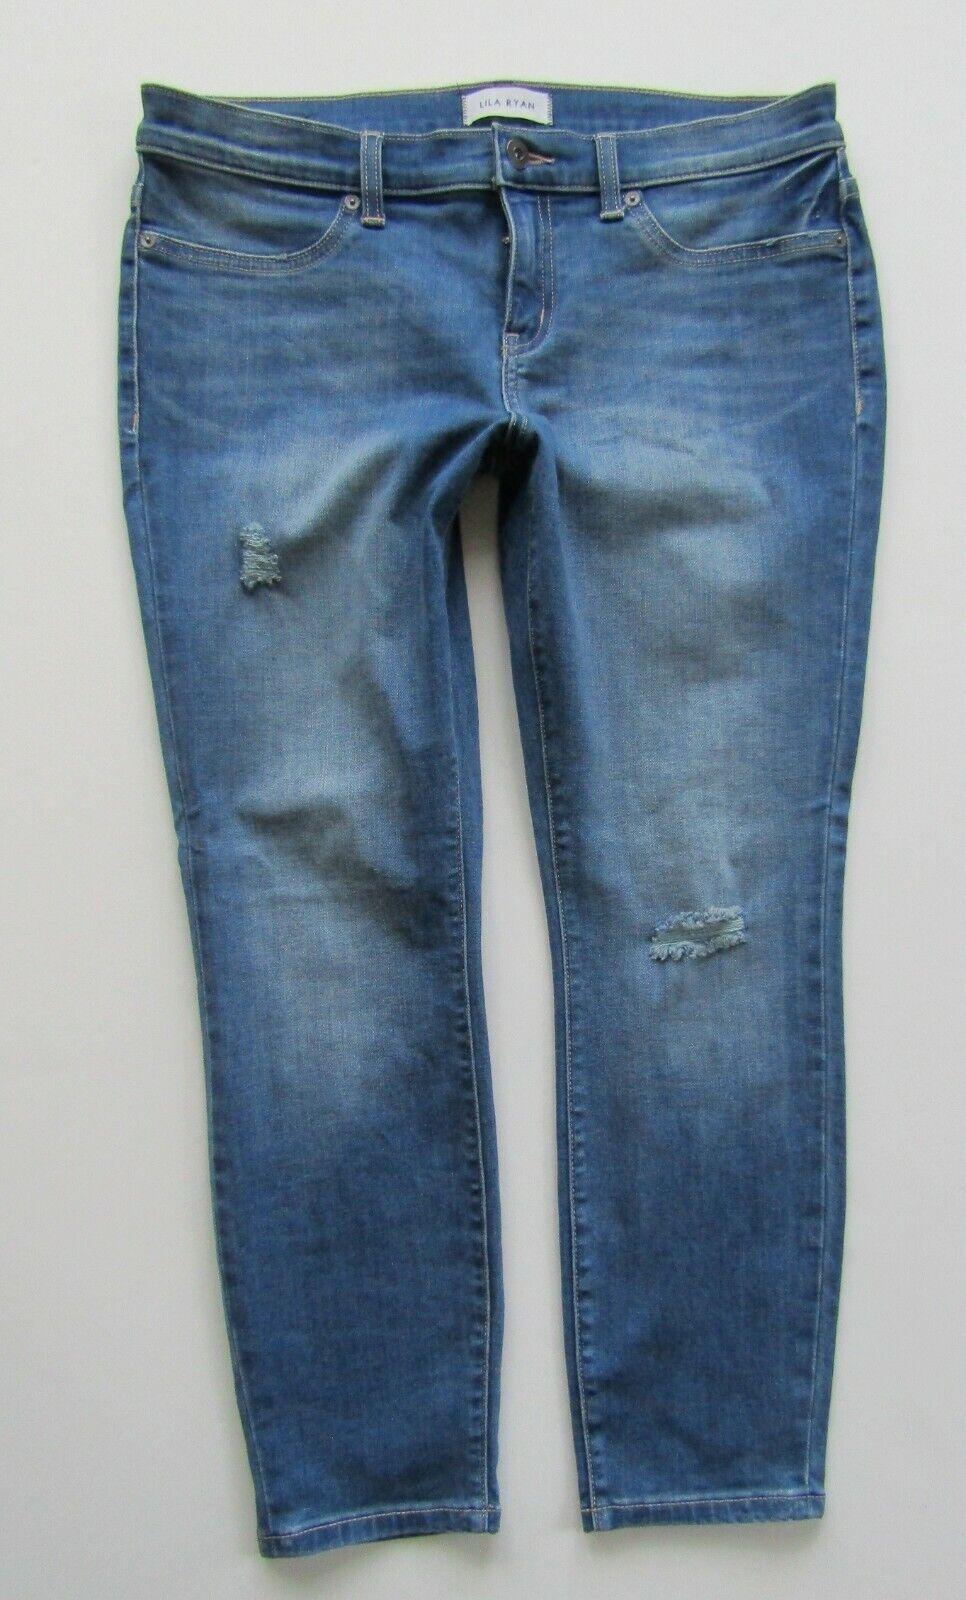 purple Ryan Skinny Ankle Crop Distressed Jean in Prescott - Size 32 Petite